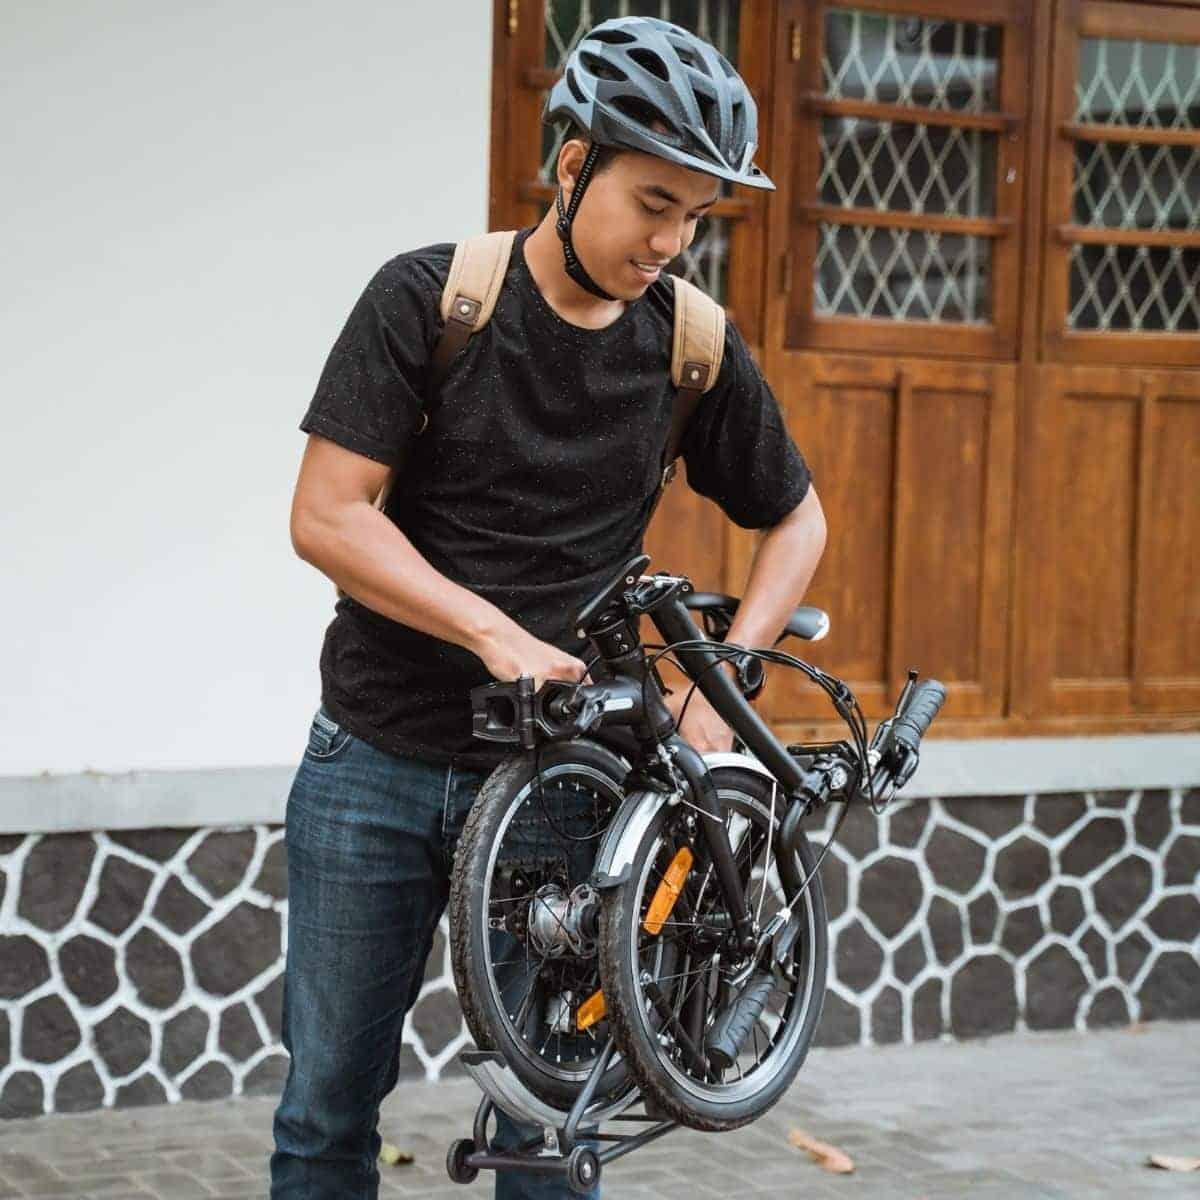 Person on a sidewalk holding a folded bike.